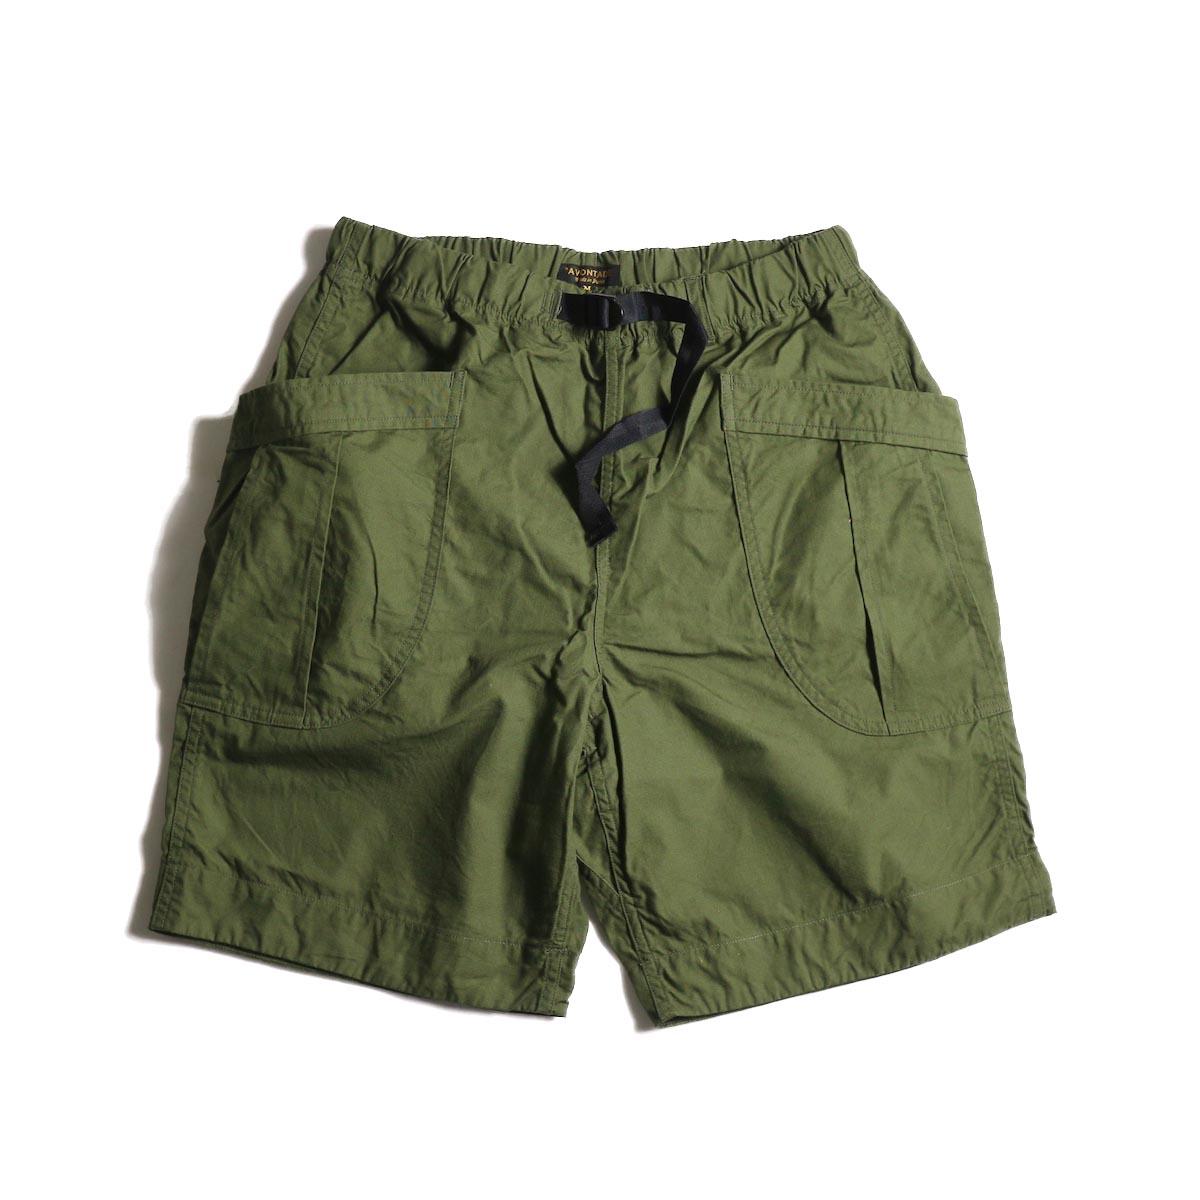 A VONTADE / Fatigue Shorts (Olive)